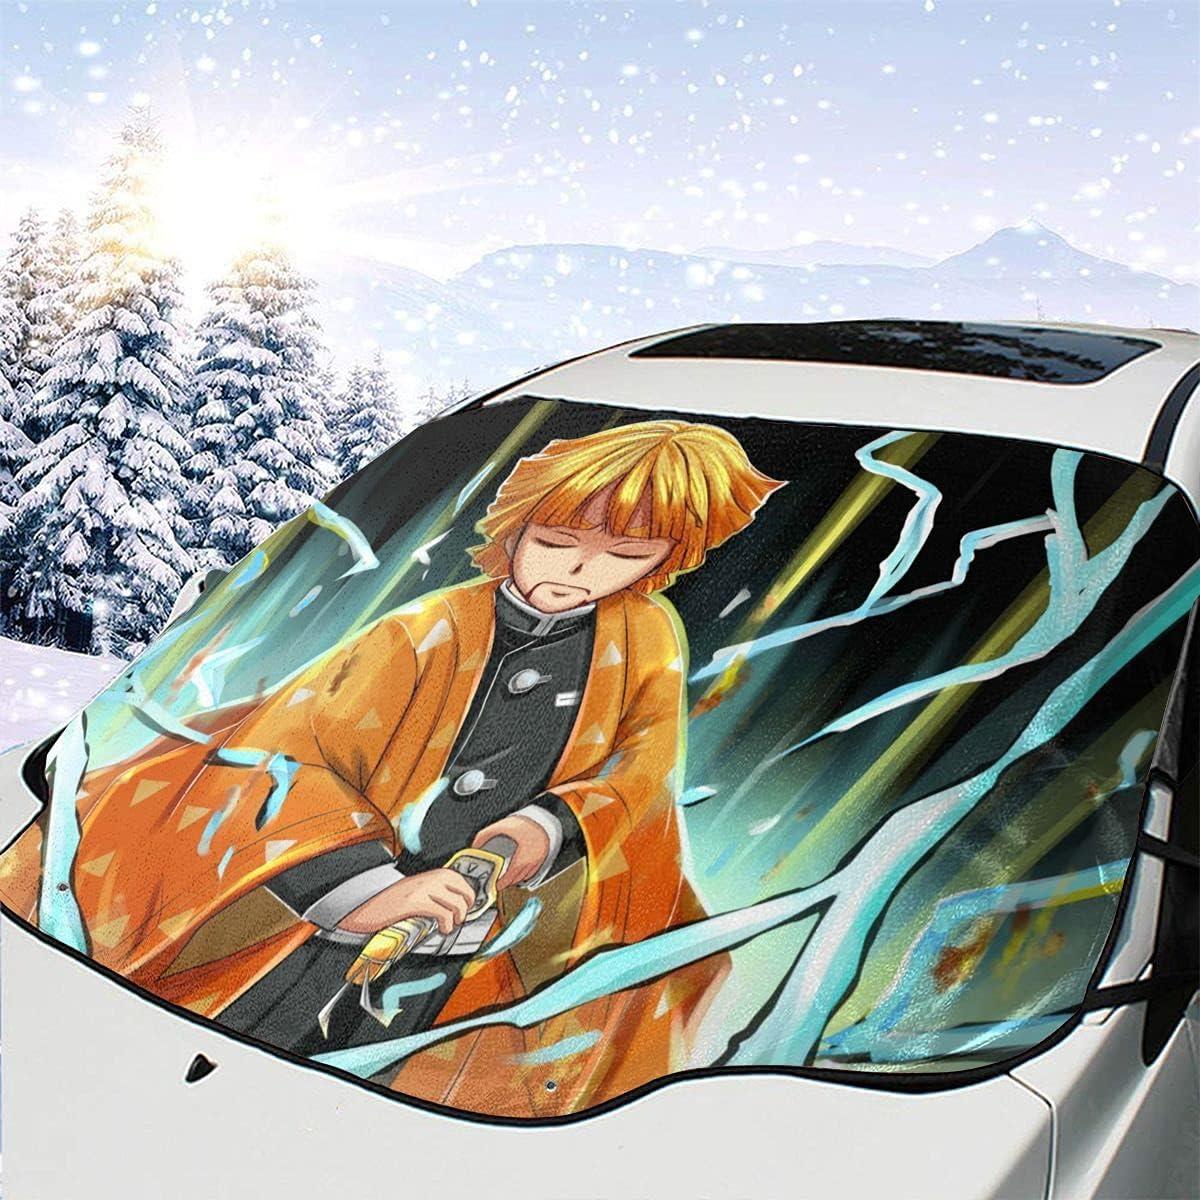 Awhgbnl Ds Zenitsu Anime Max 88% OFF Car Ranking TOP12 Snow Manga Design Windshield Cover